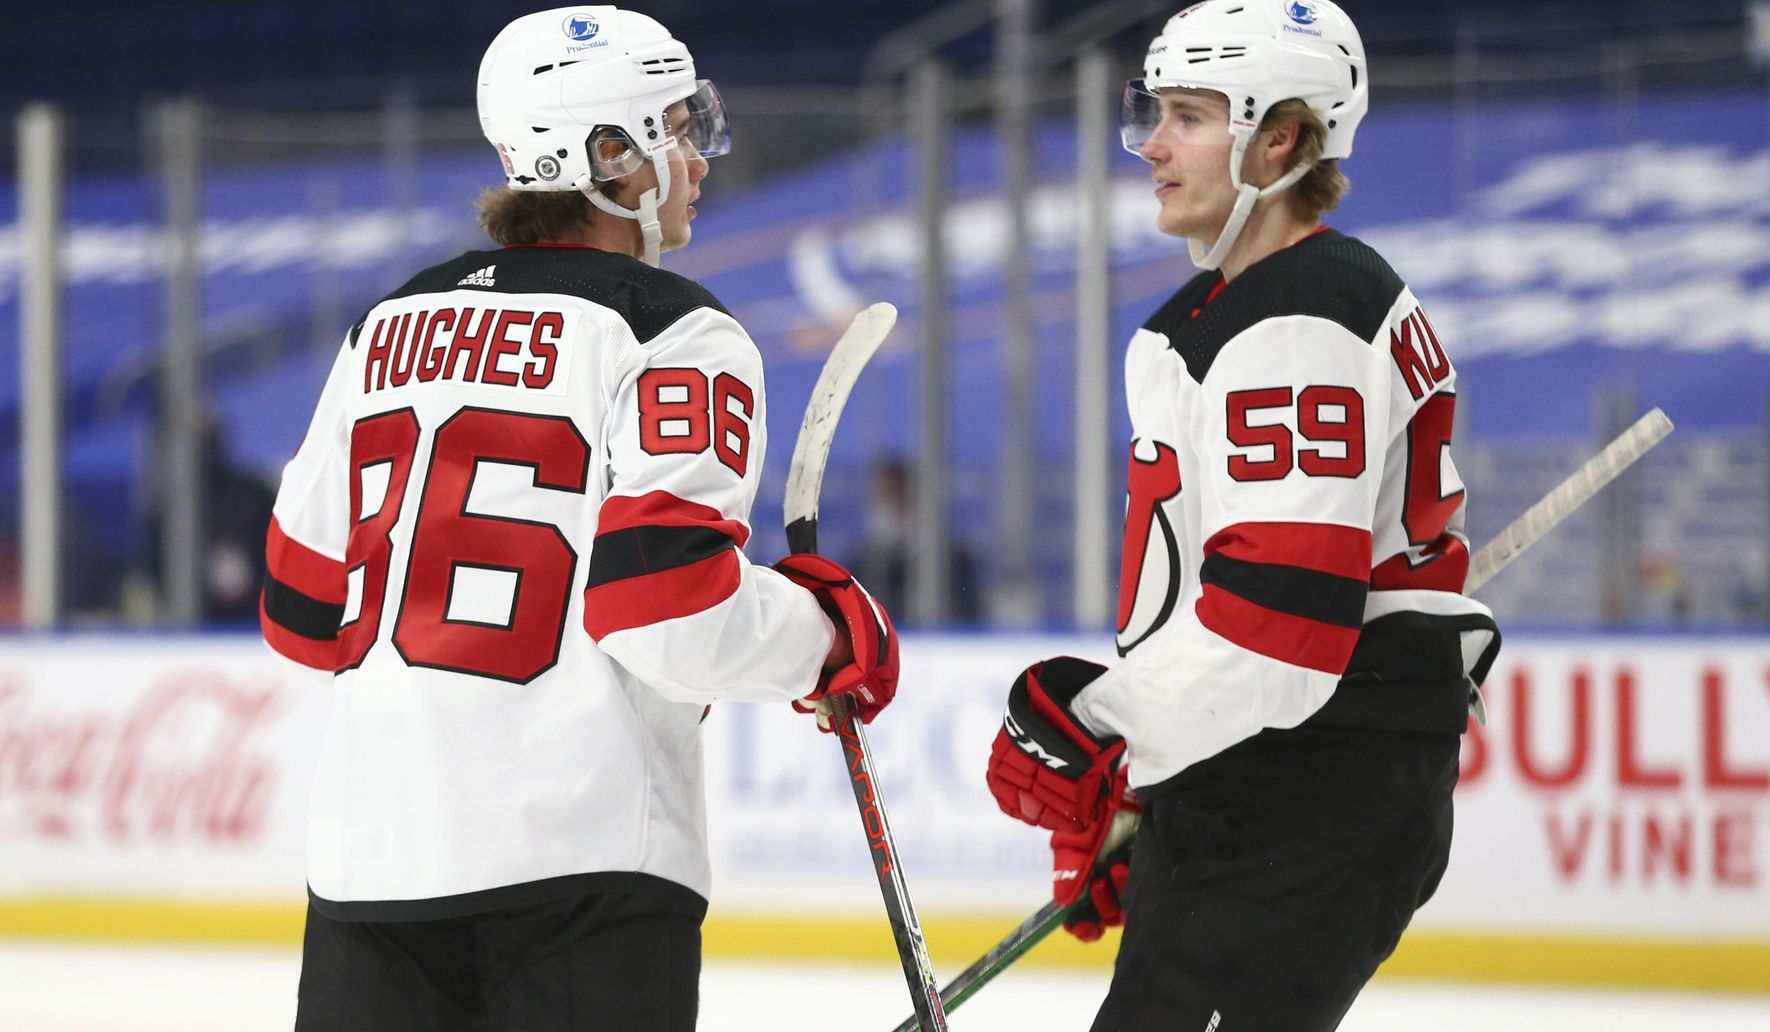 Boqvist scores go-ahead goal in Devils' 6-3 win over Sabres